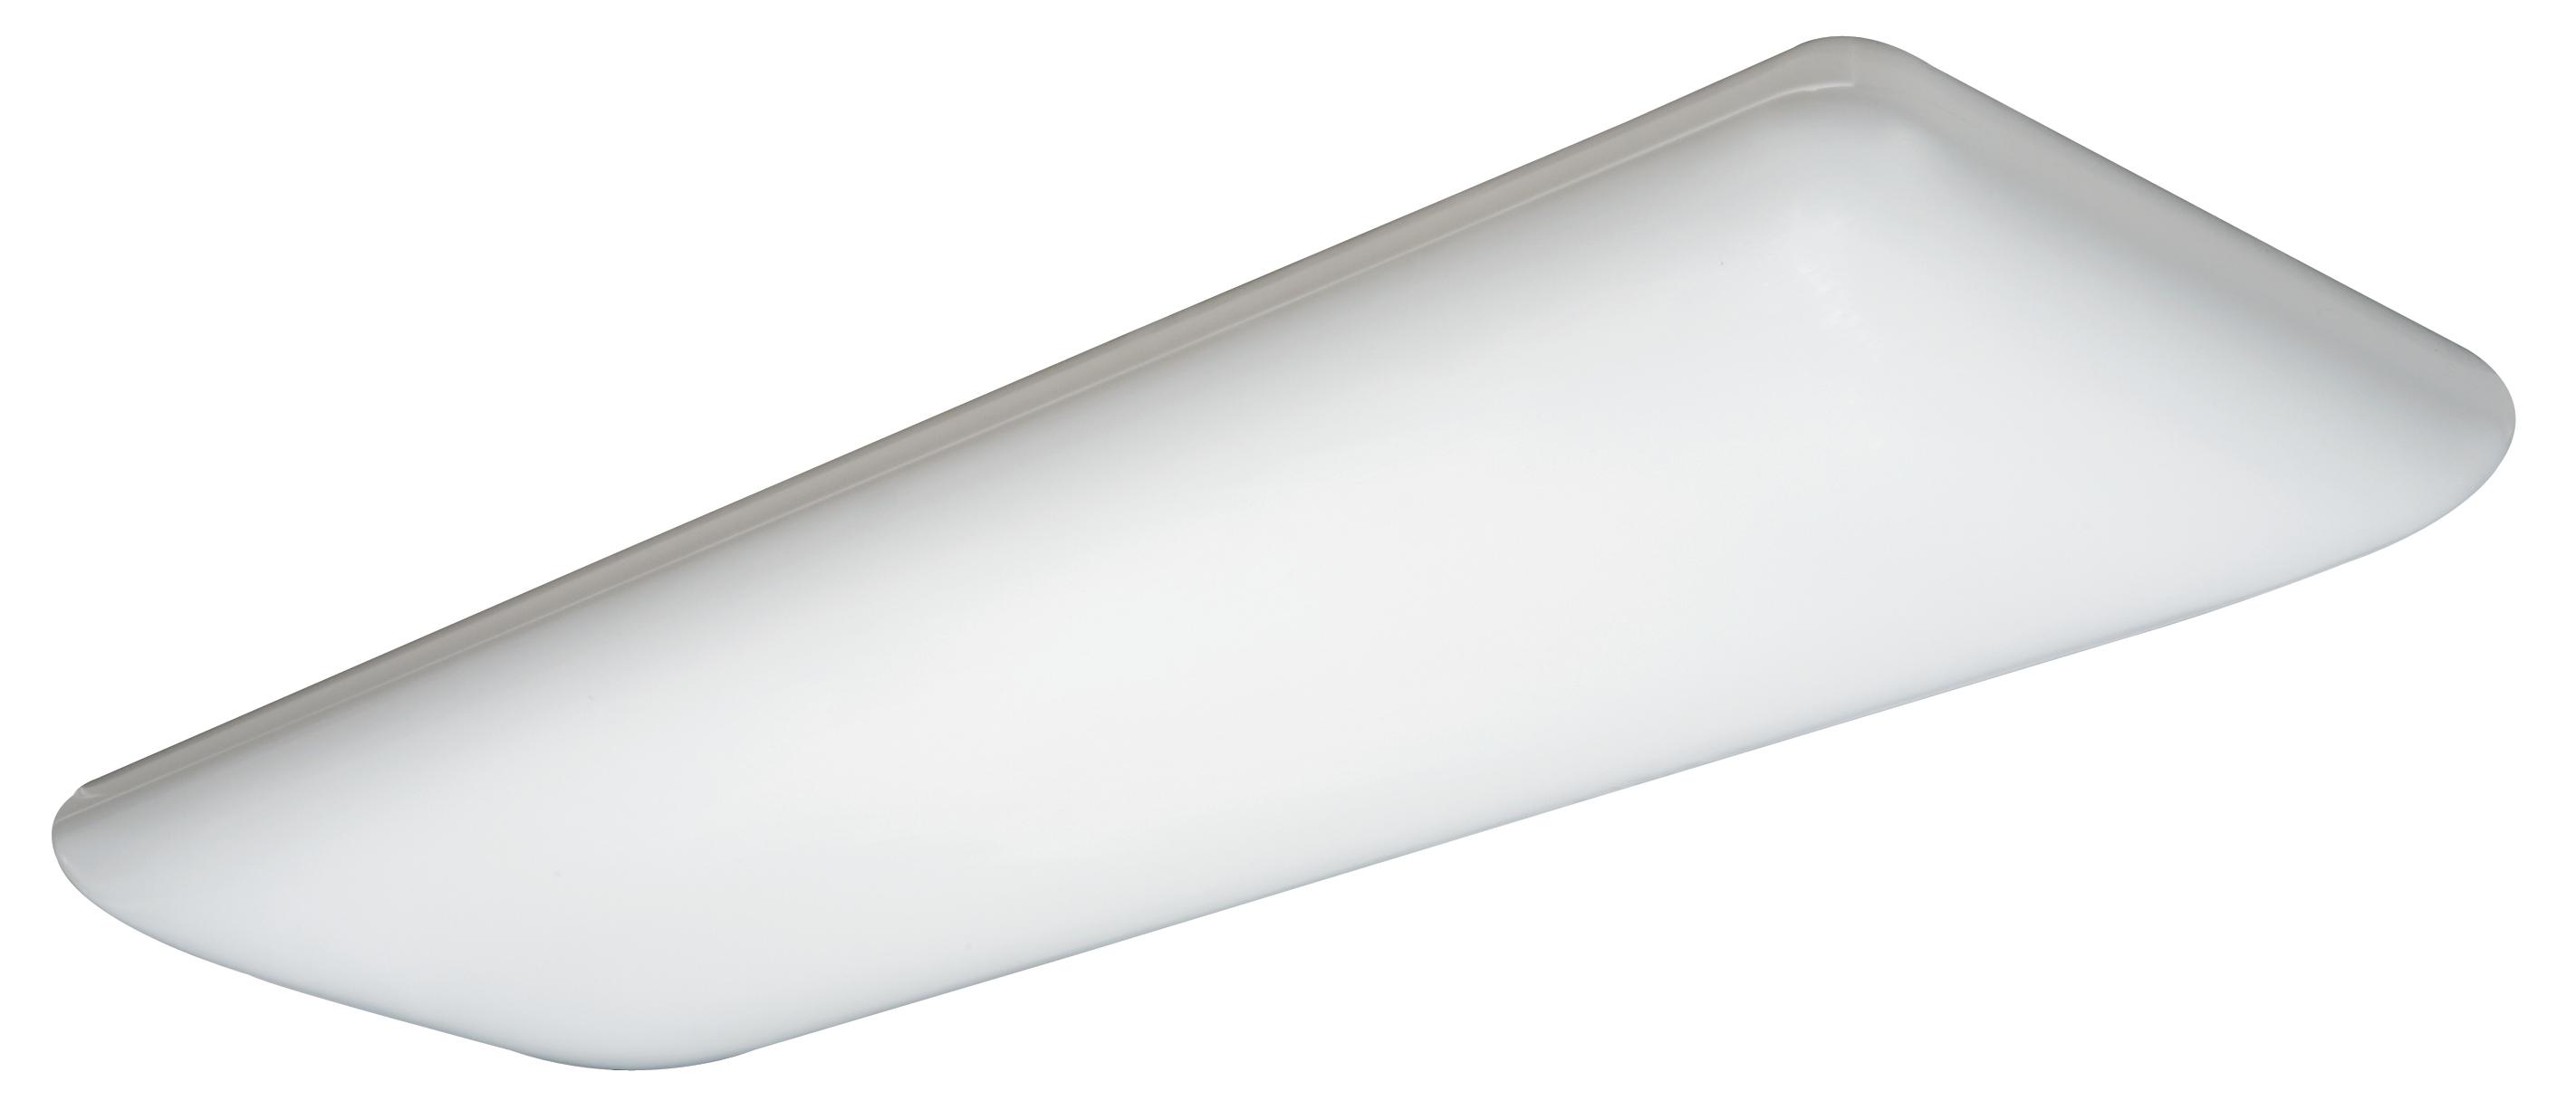 Lithonia Lighting® 10642RE